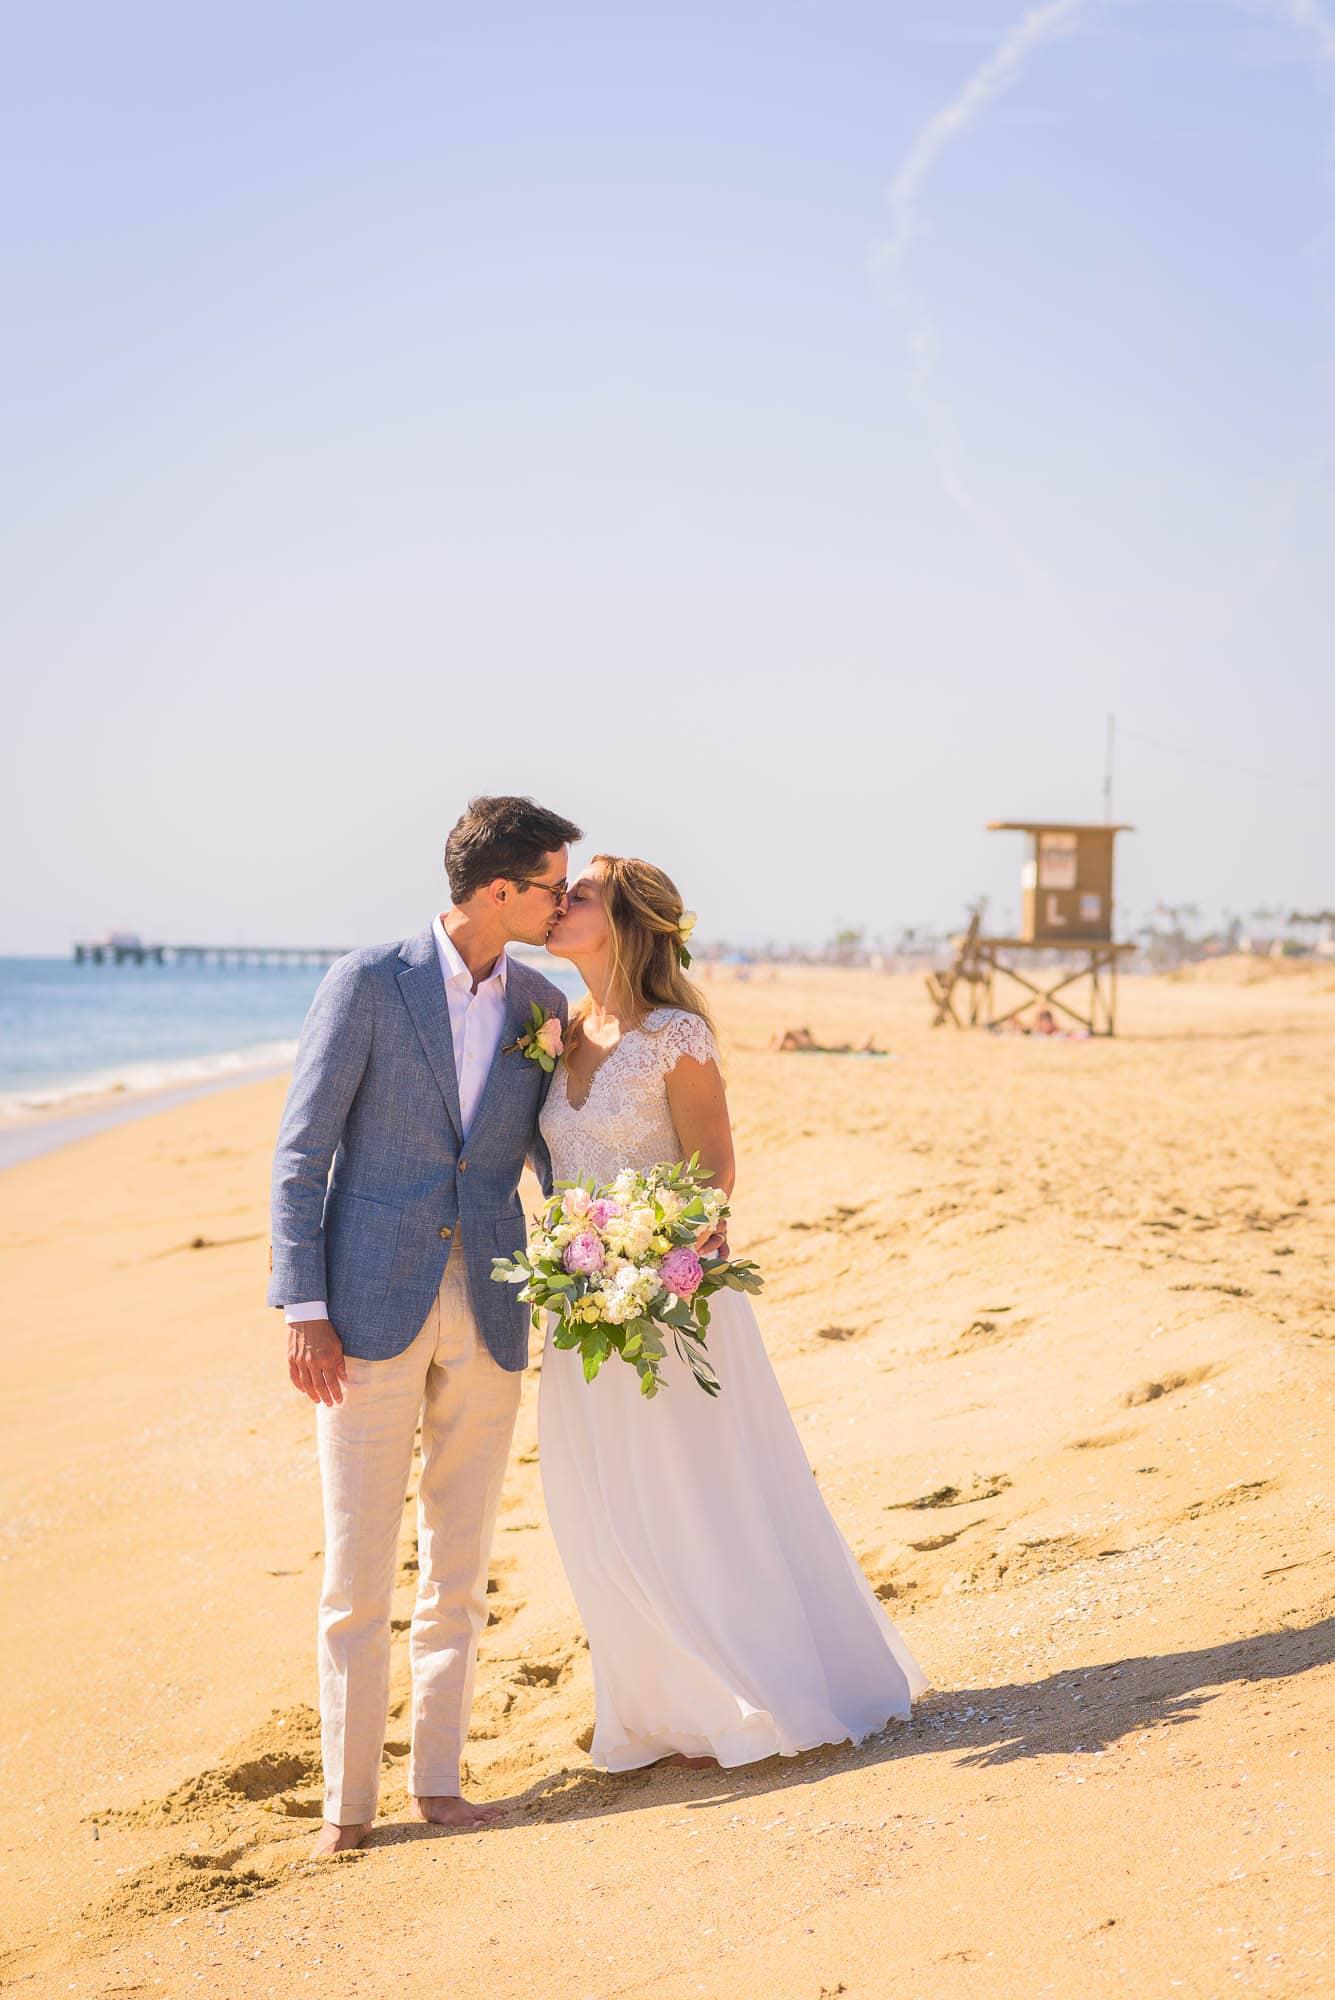 043_Alan_and_Heidi_Wedding_Verena_Andreas